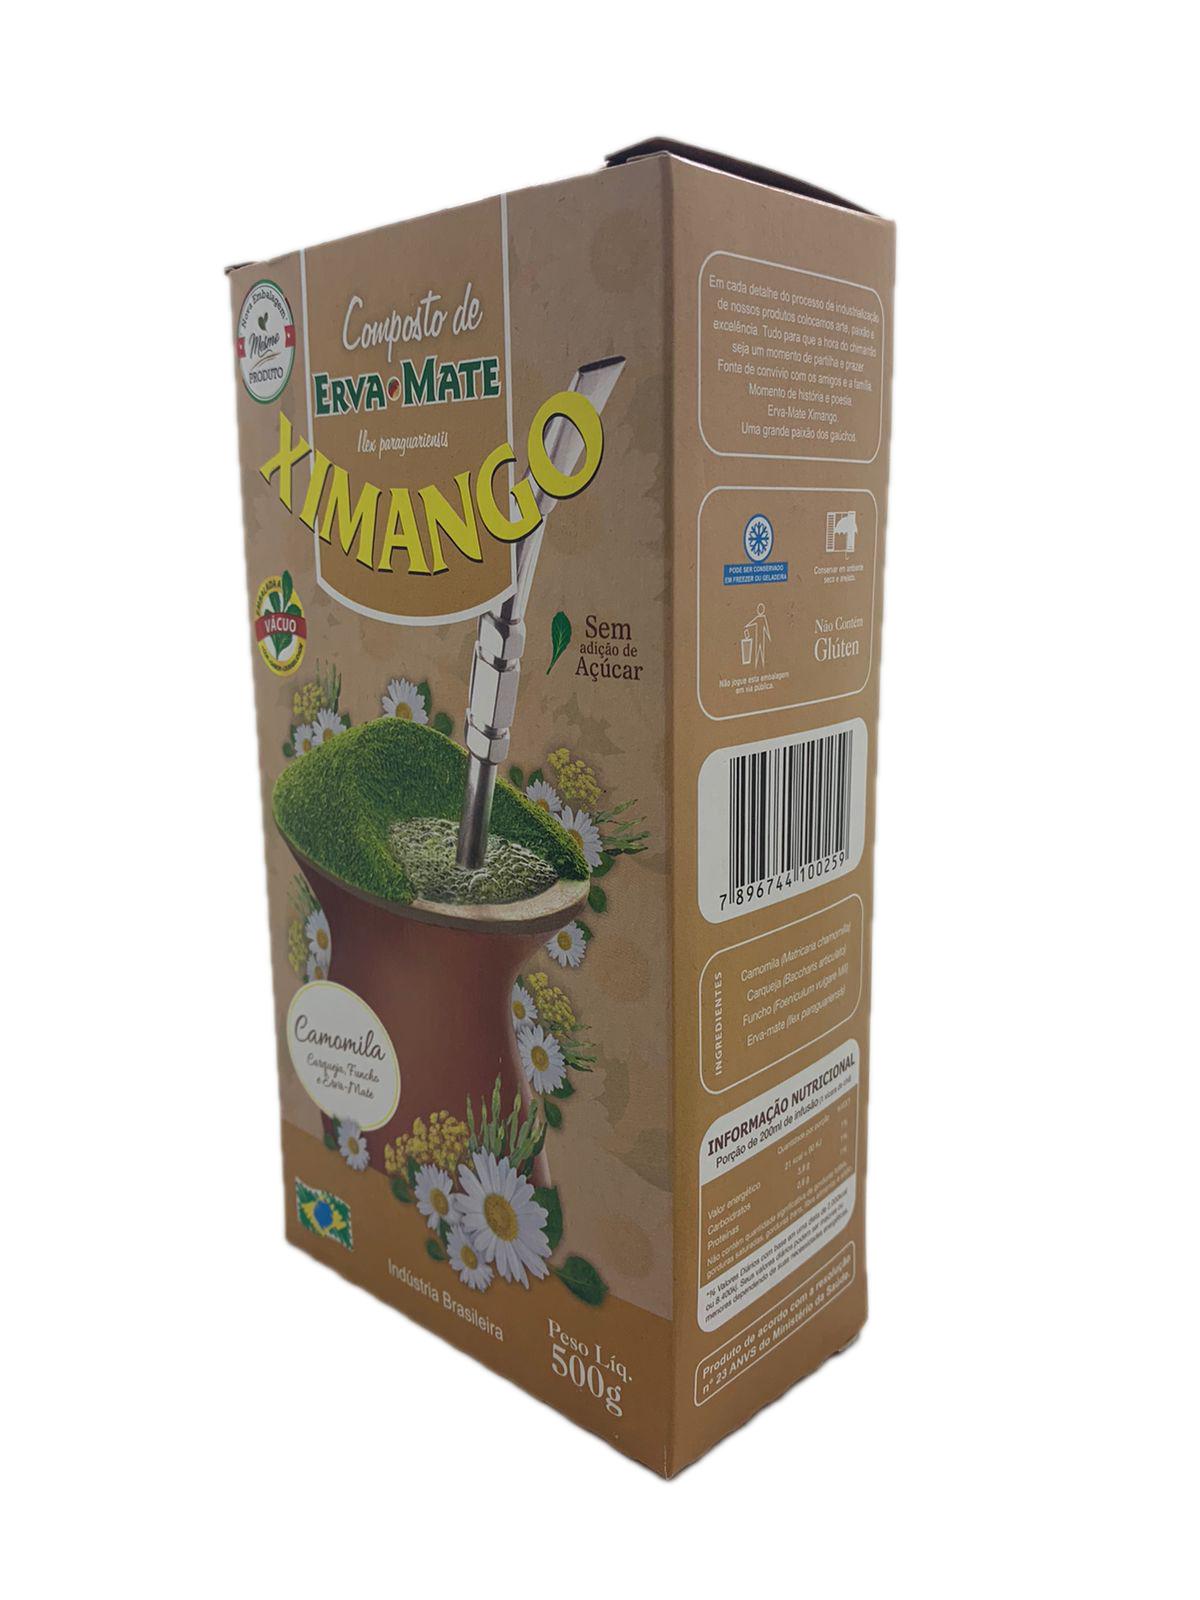 Erva mate Ximango Camomila 500 g